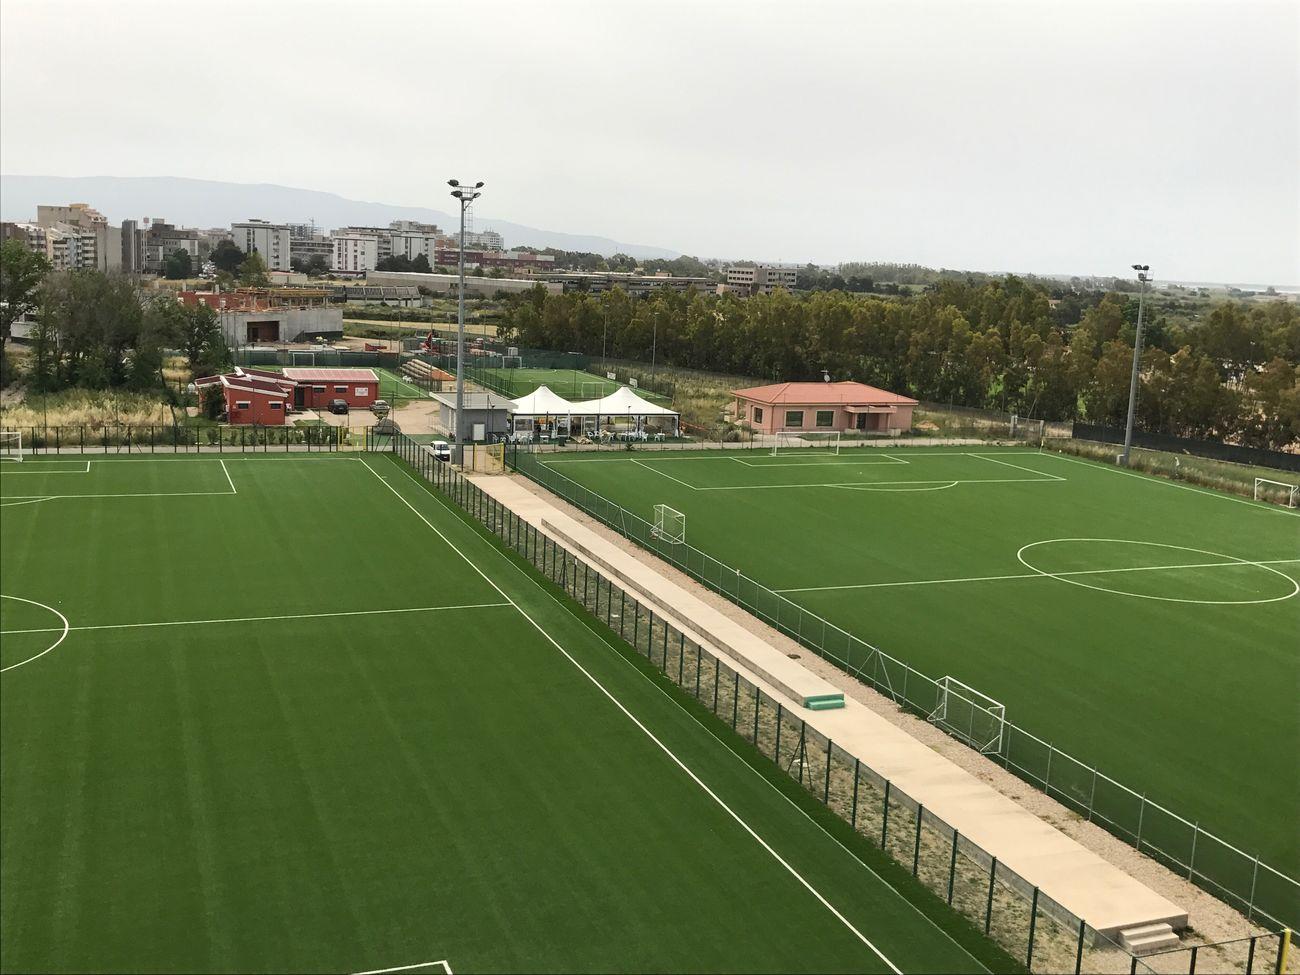 Sport Soccer Day First Eyeem Photo Goal Post Work In Progress Work Day Sardegna Sardegna Da Scoprire